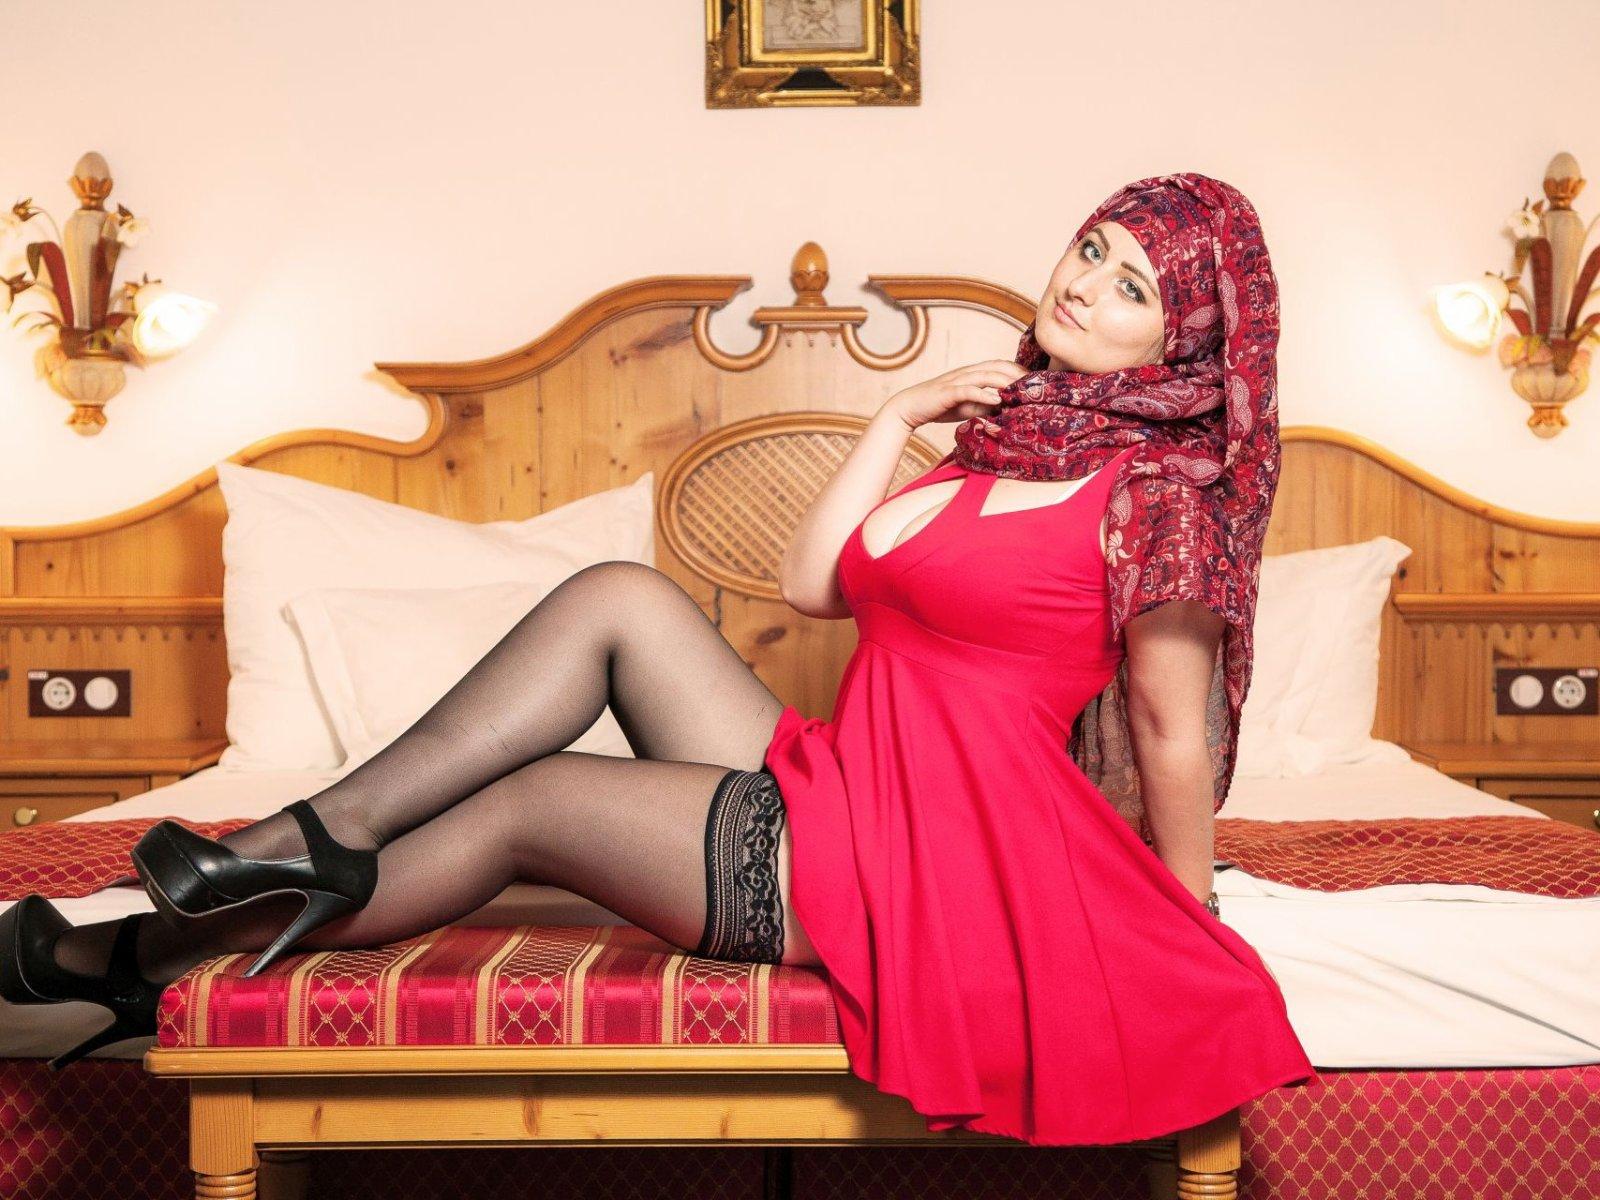 Virgin adult phorn arabic, girl with wide hips bent over